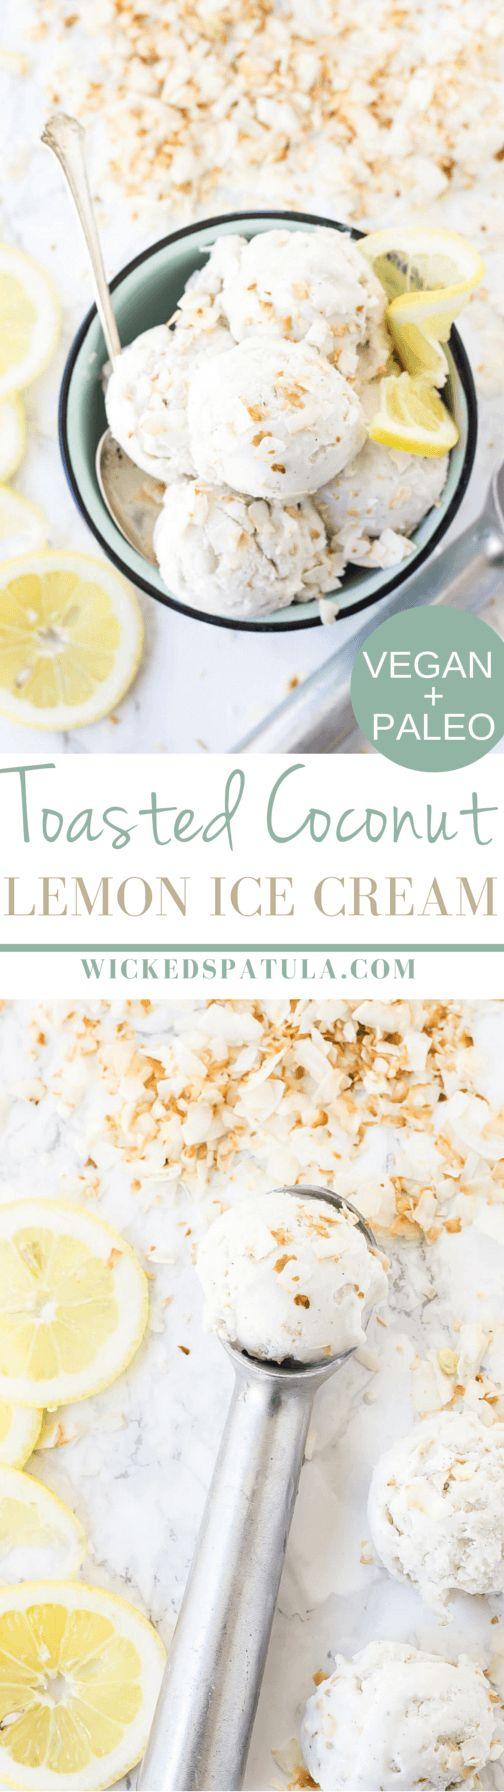 Toasted Coconut Lemon Ice Cream - Vegan + Paleo